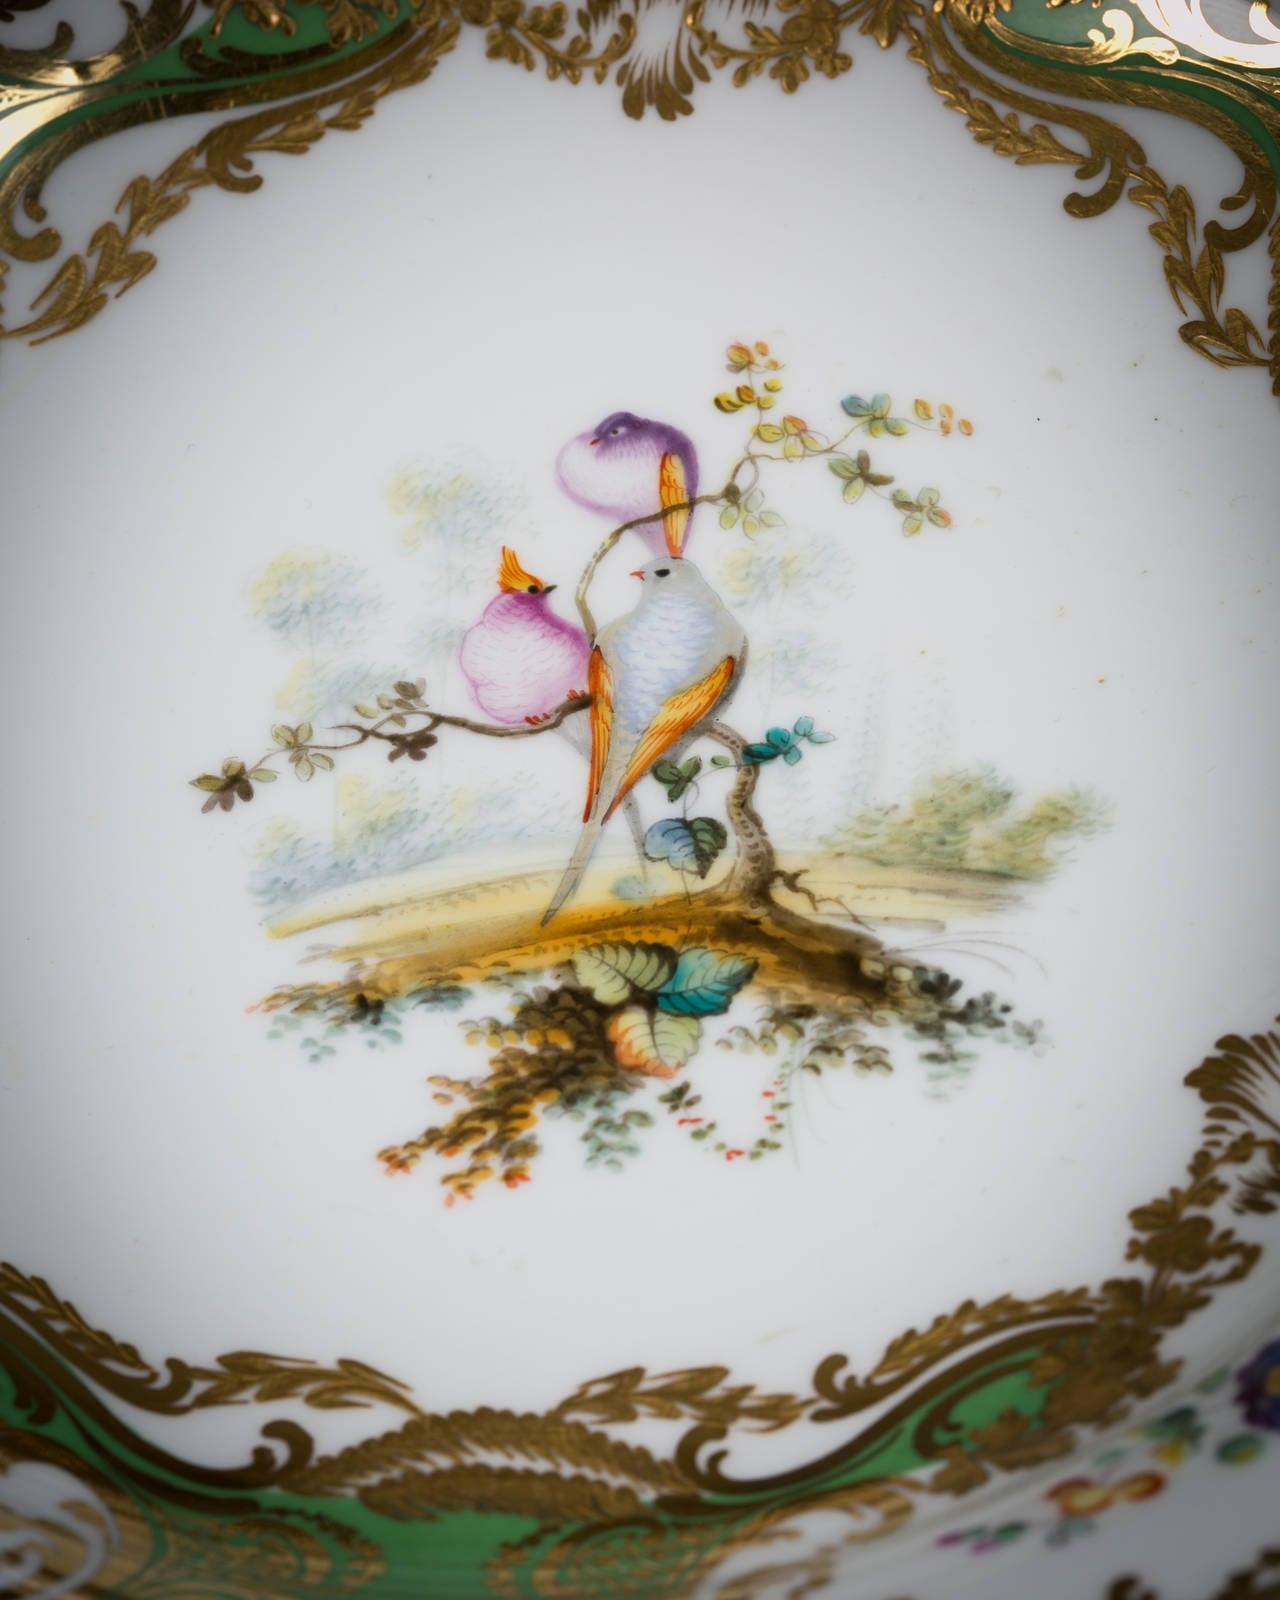 English Coalport Porcelain Dessert Service, circa 1850 For Sale 3